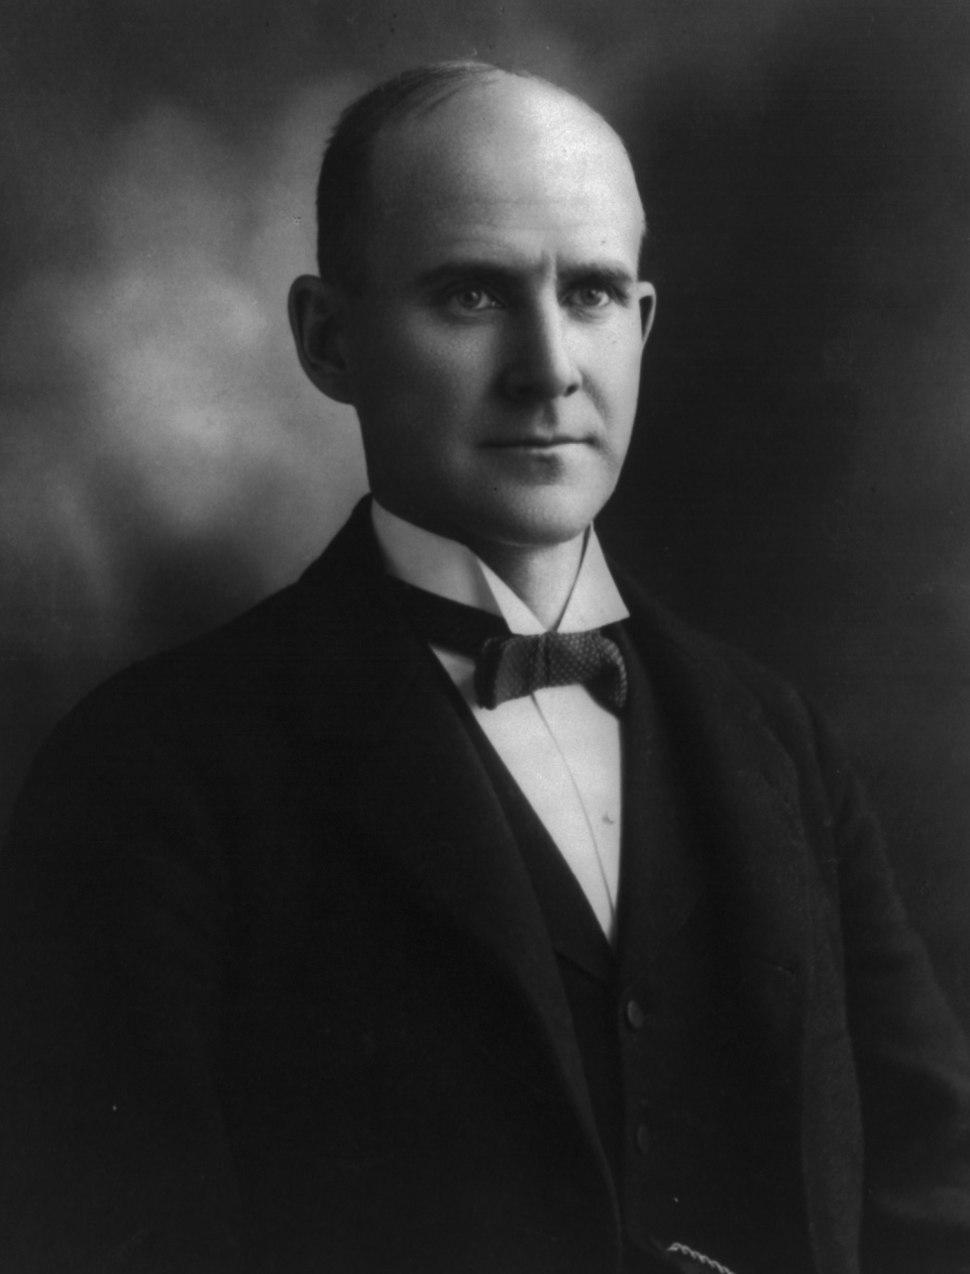 Eugene V. Debs, bw photo portrait, 1897